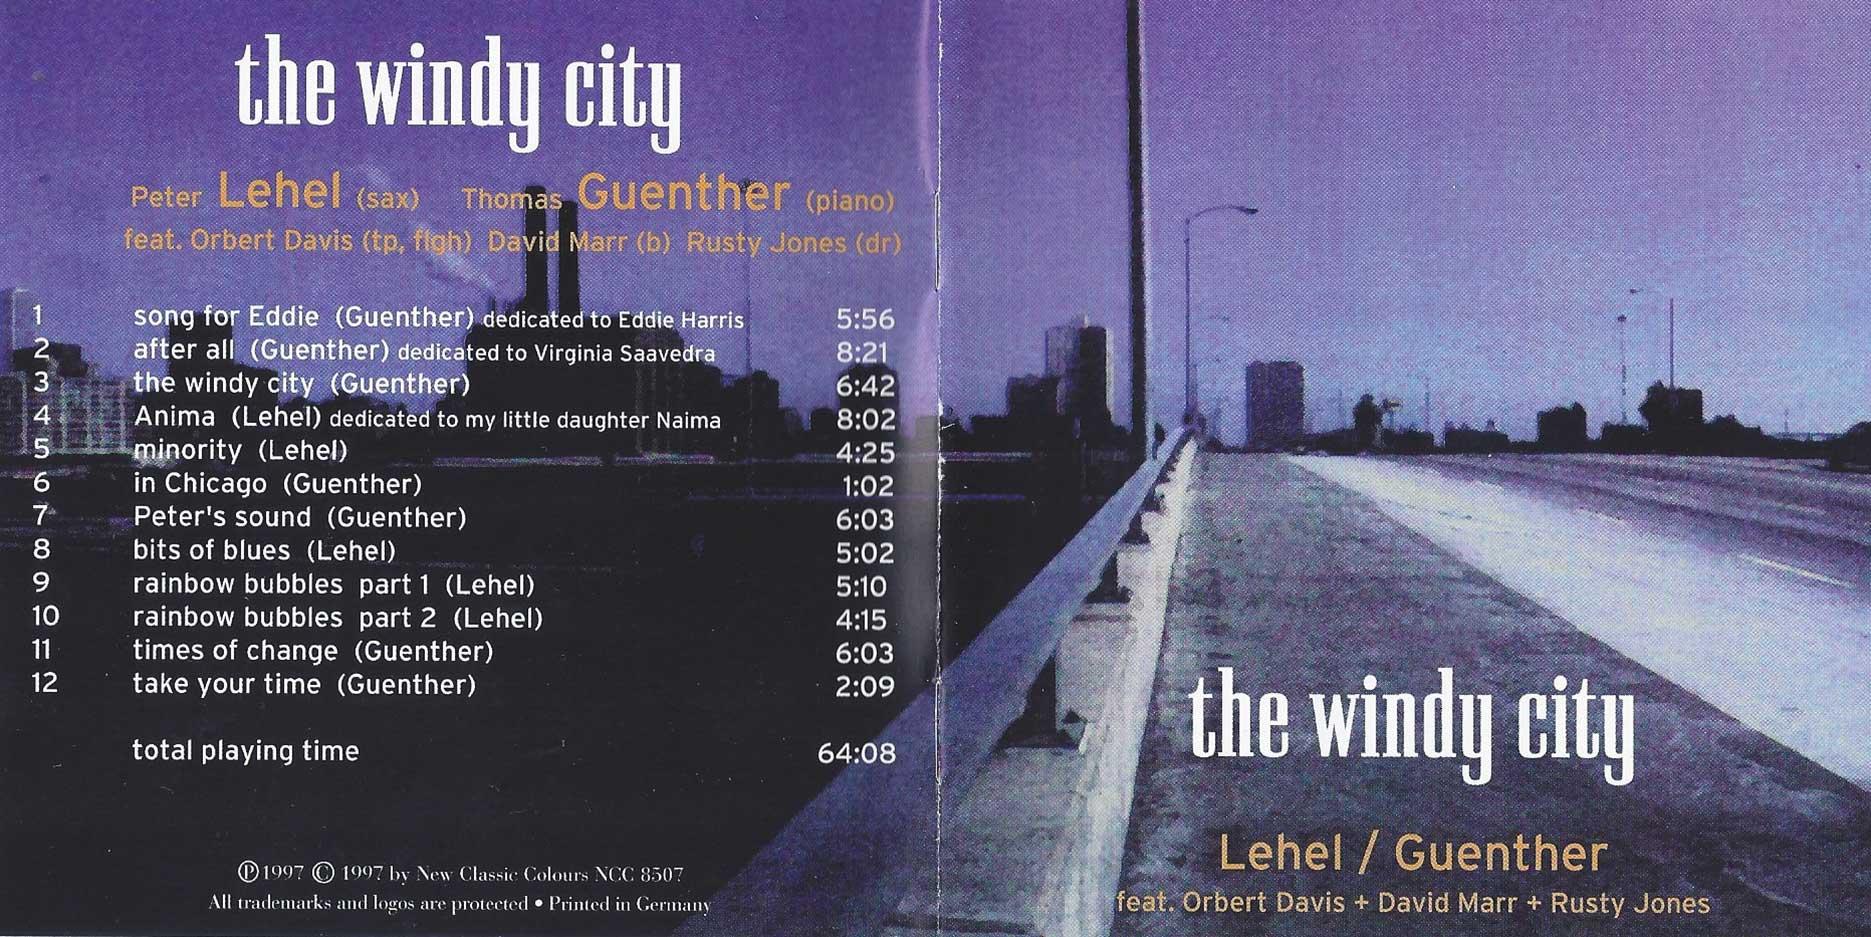 Windy-City-CD-Original-Cover-Art